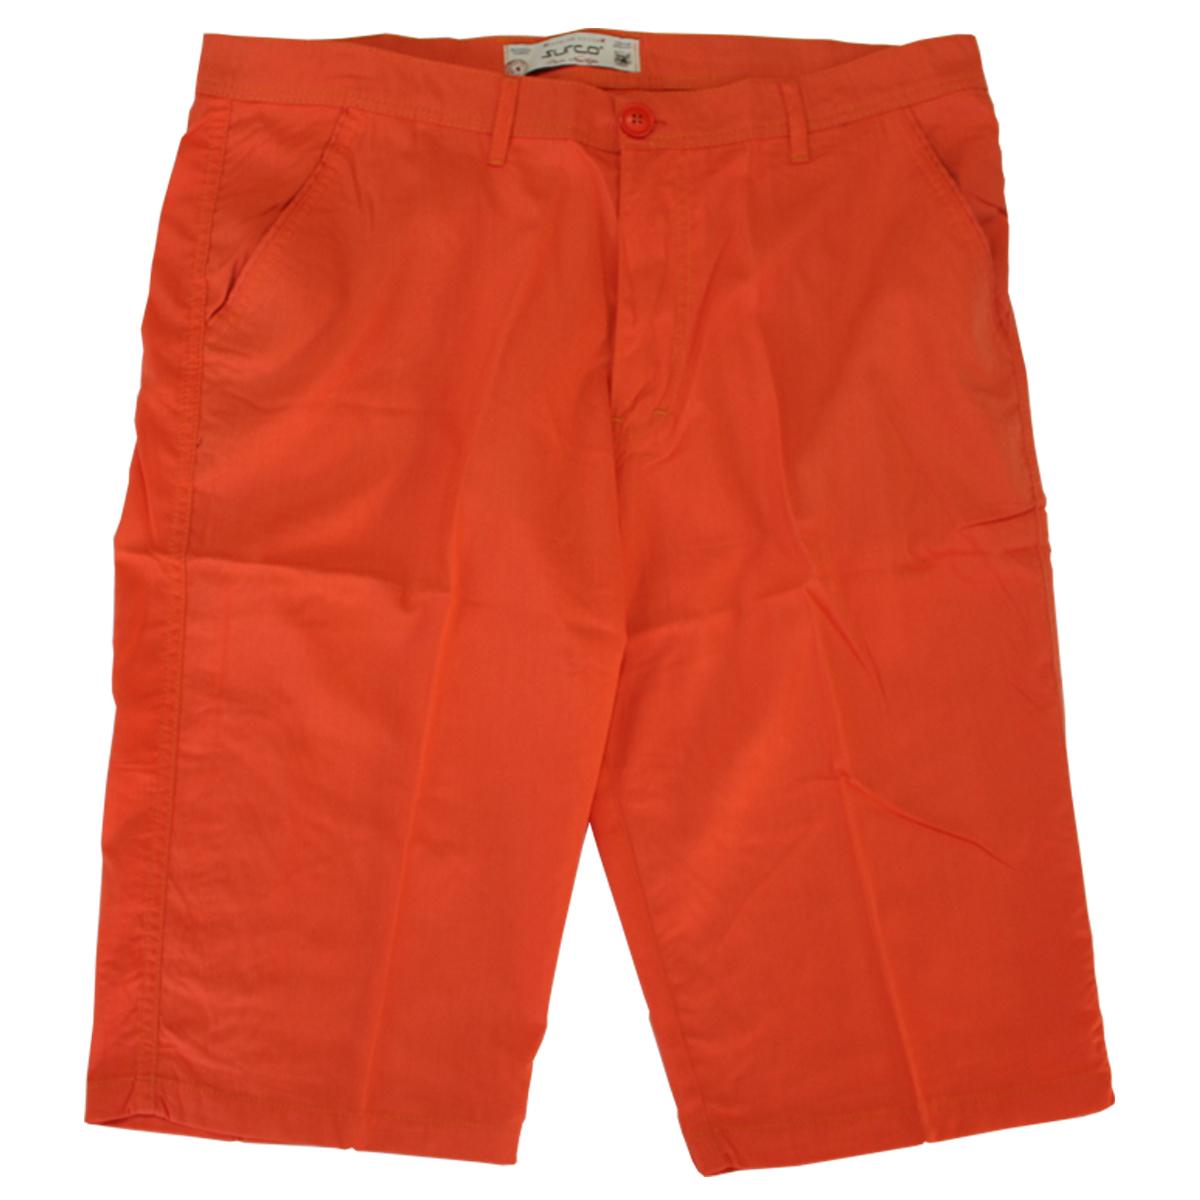 Pantalon trei sferturi portocaliu, Marime 56 - egato.ro